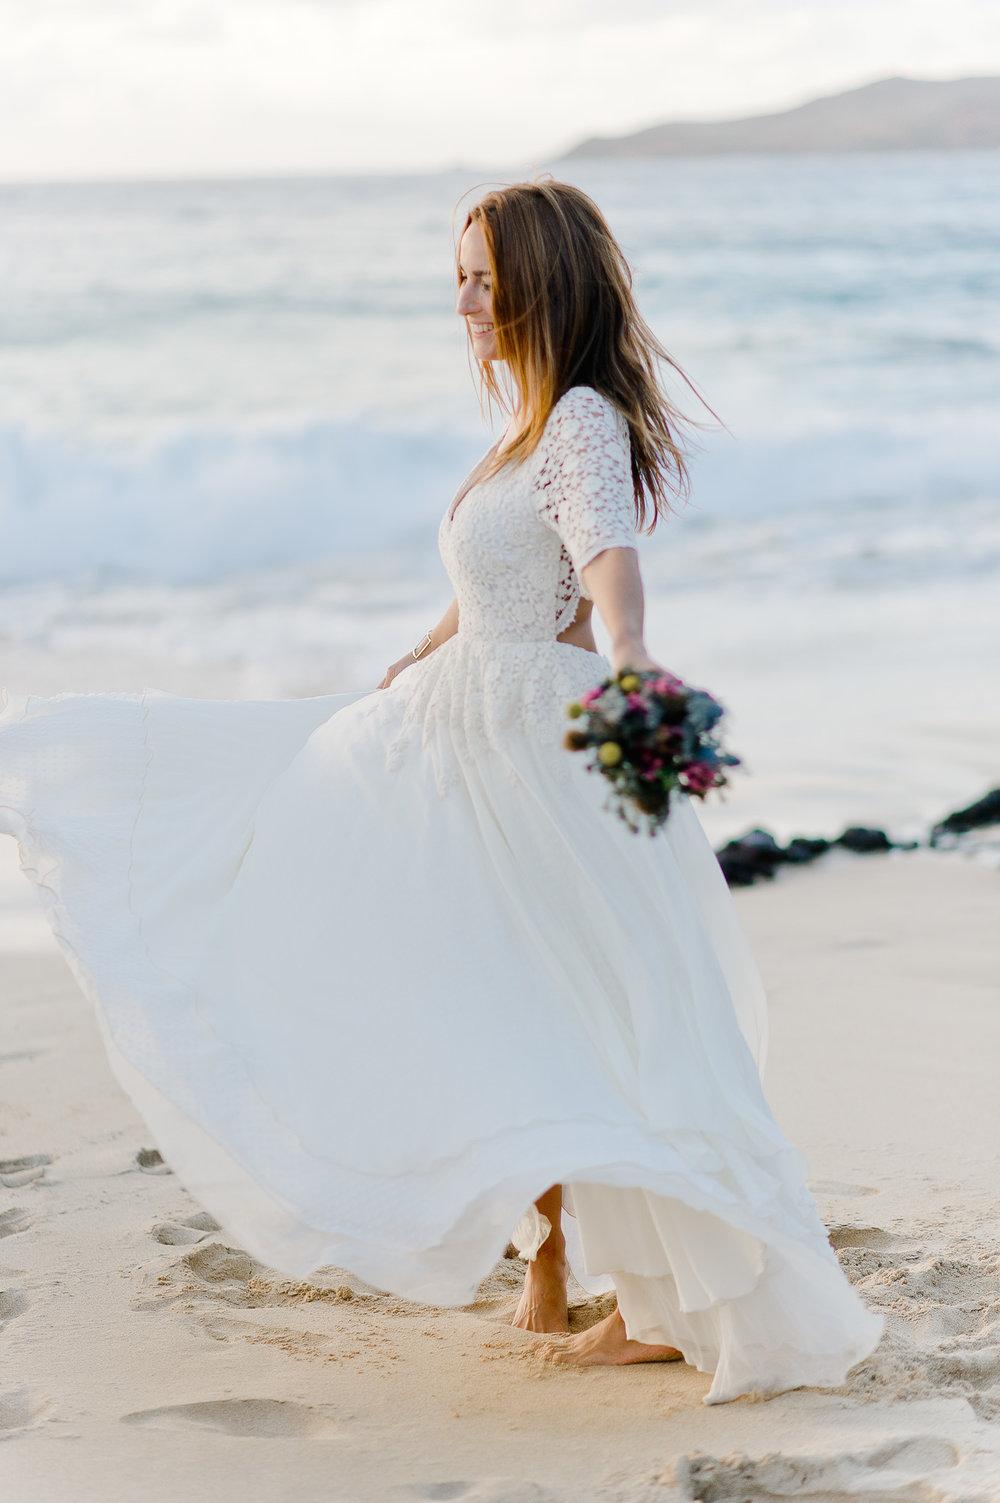 anna hari wedding photography-71.jpg